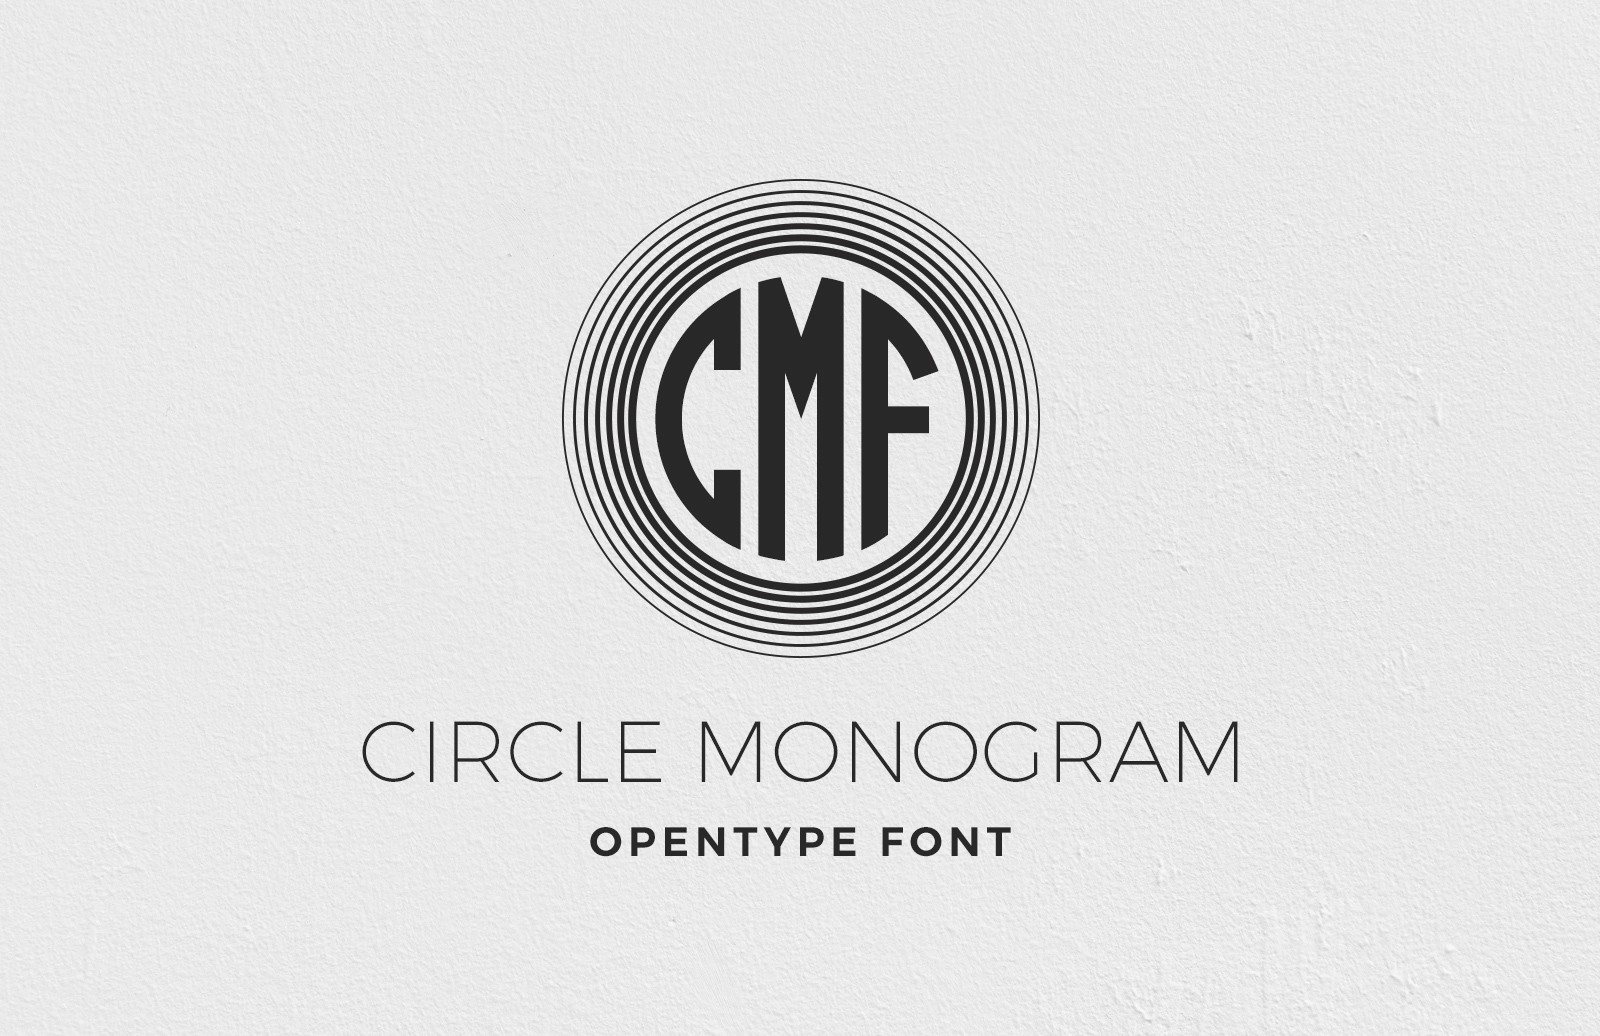 Circle Monogram Font Preview 1A